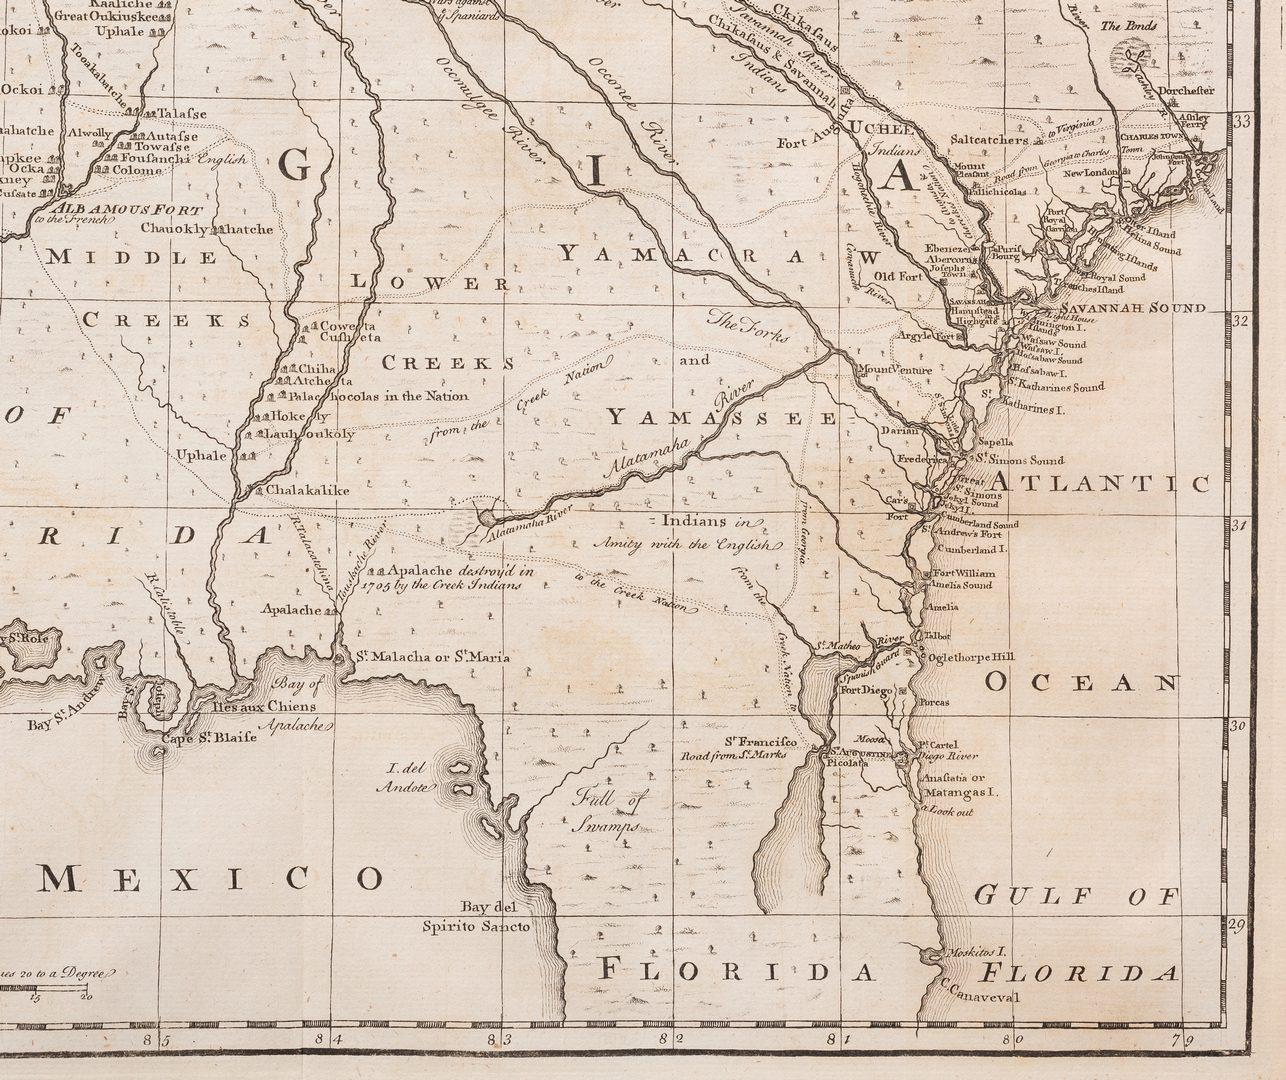 Lot 291: A New Map of Georgia, 1748 Bowen